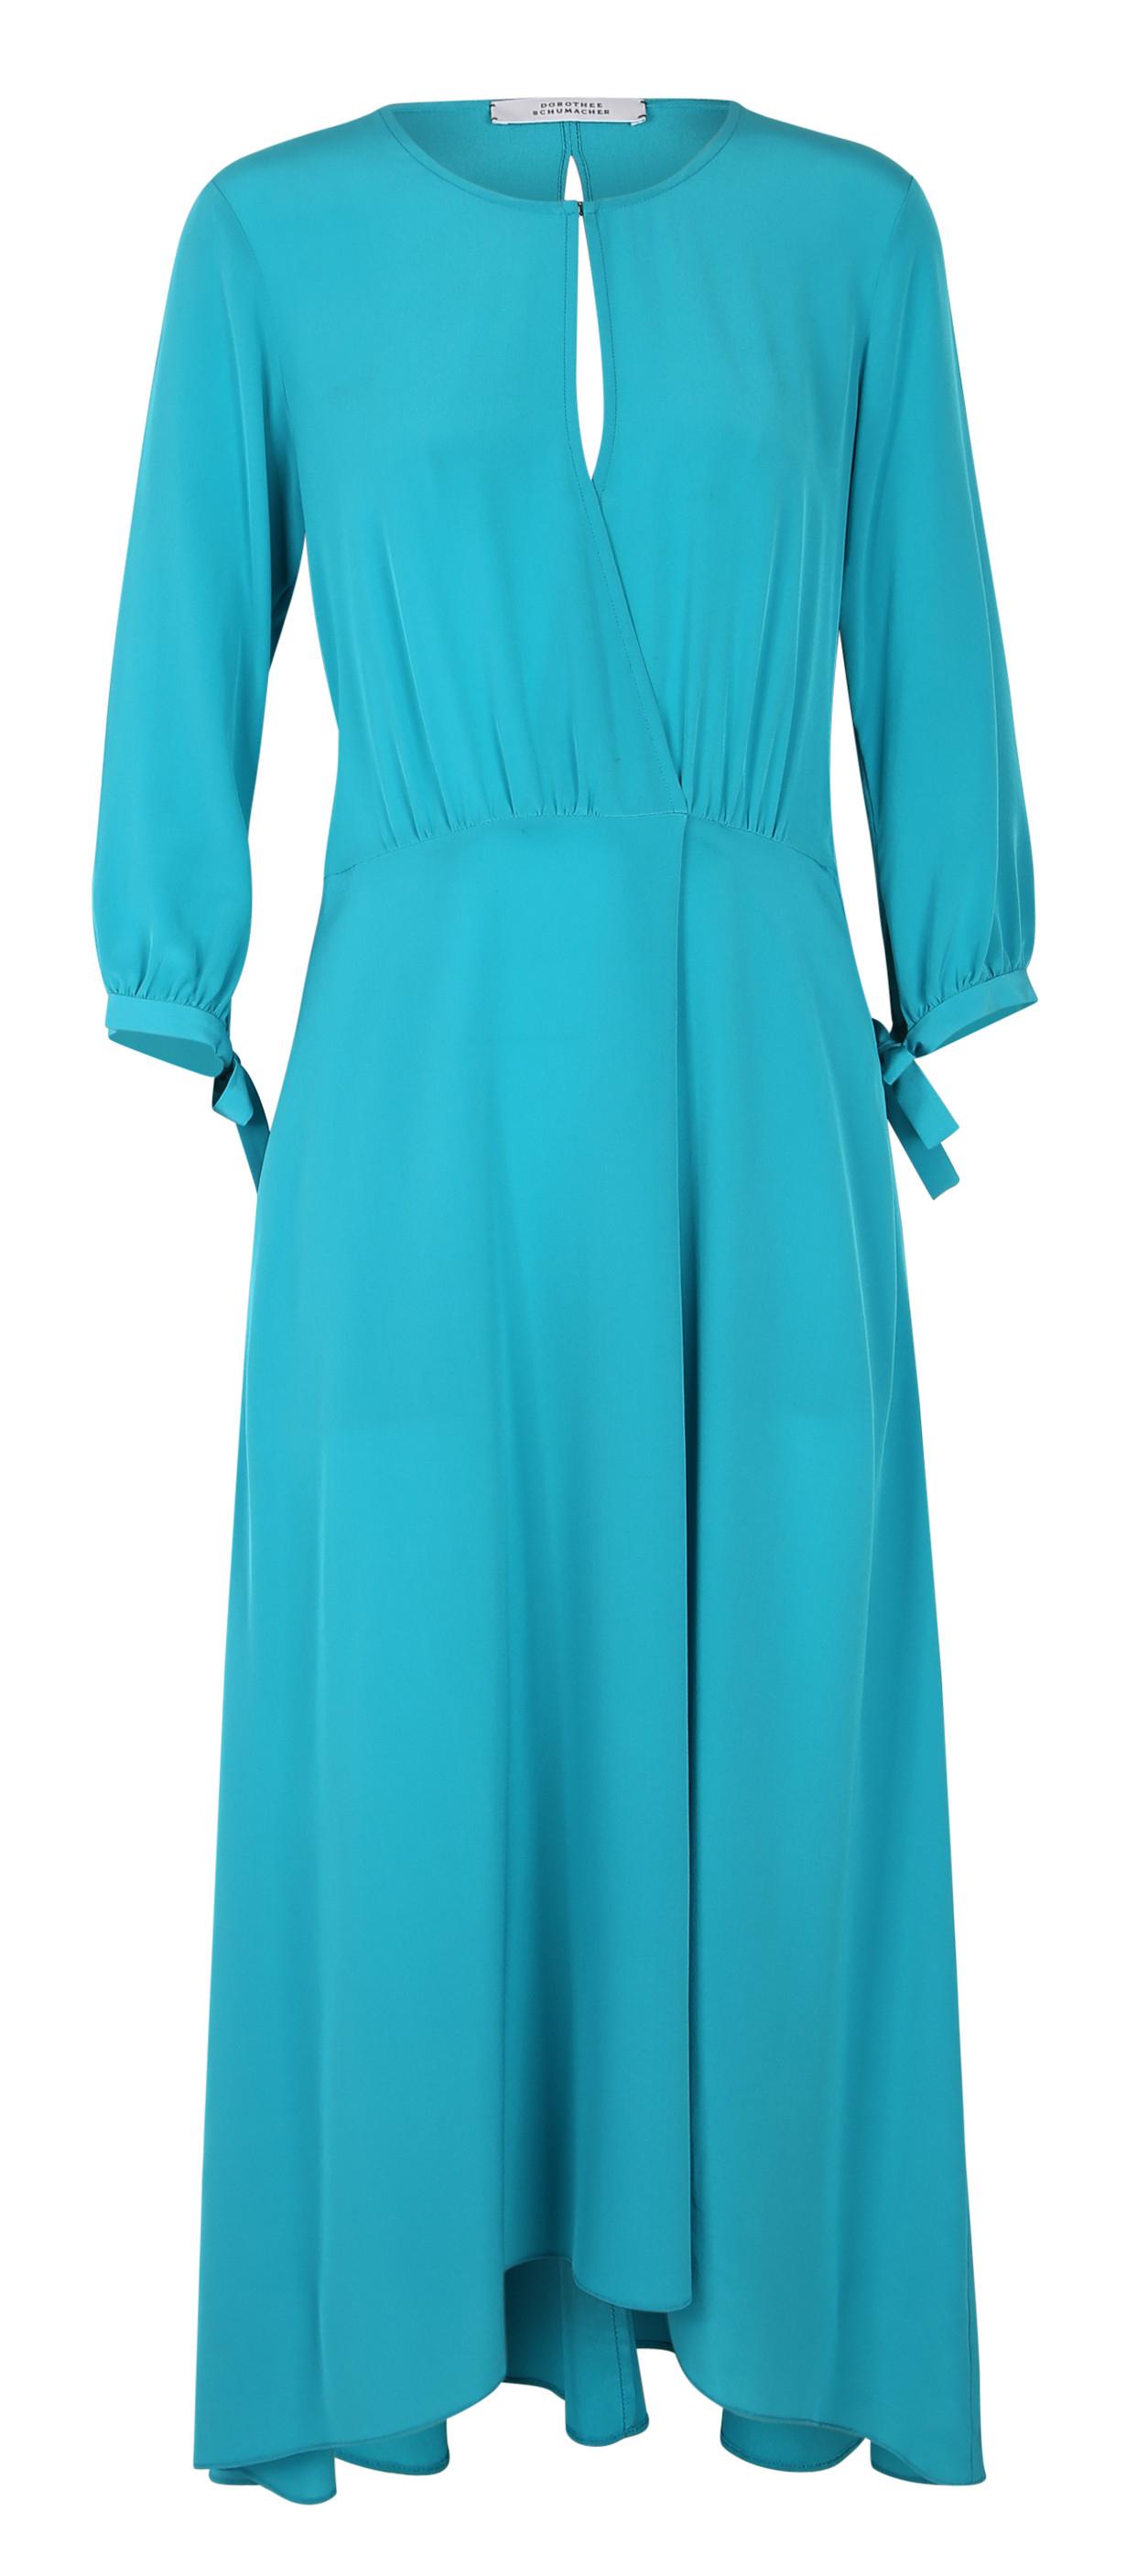 Dorothee schumacher Heat It Up Dress 3/4 in Green